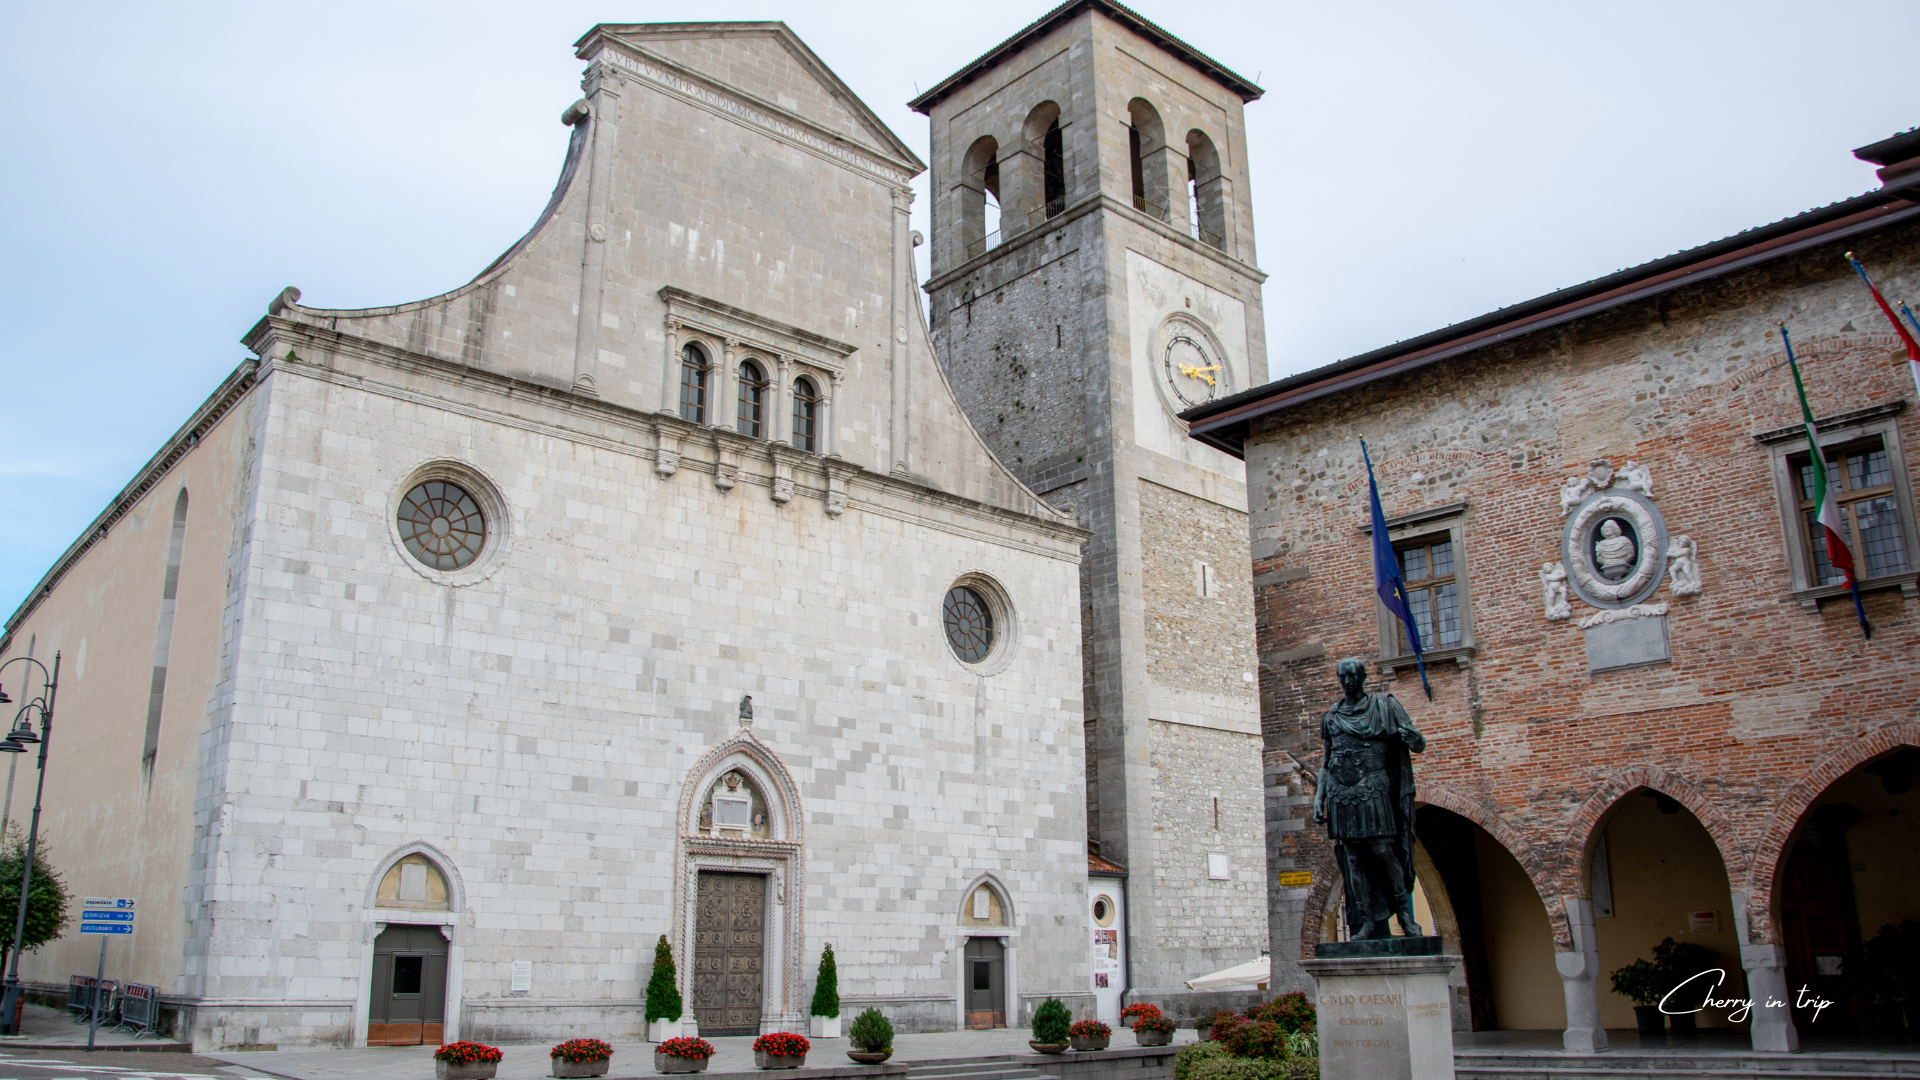 Chiesa di Santa Maria assunta, Duomo di Cividale del Friuli